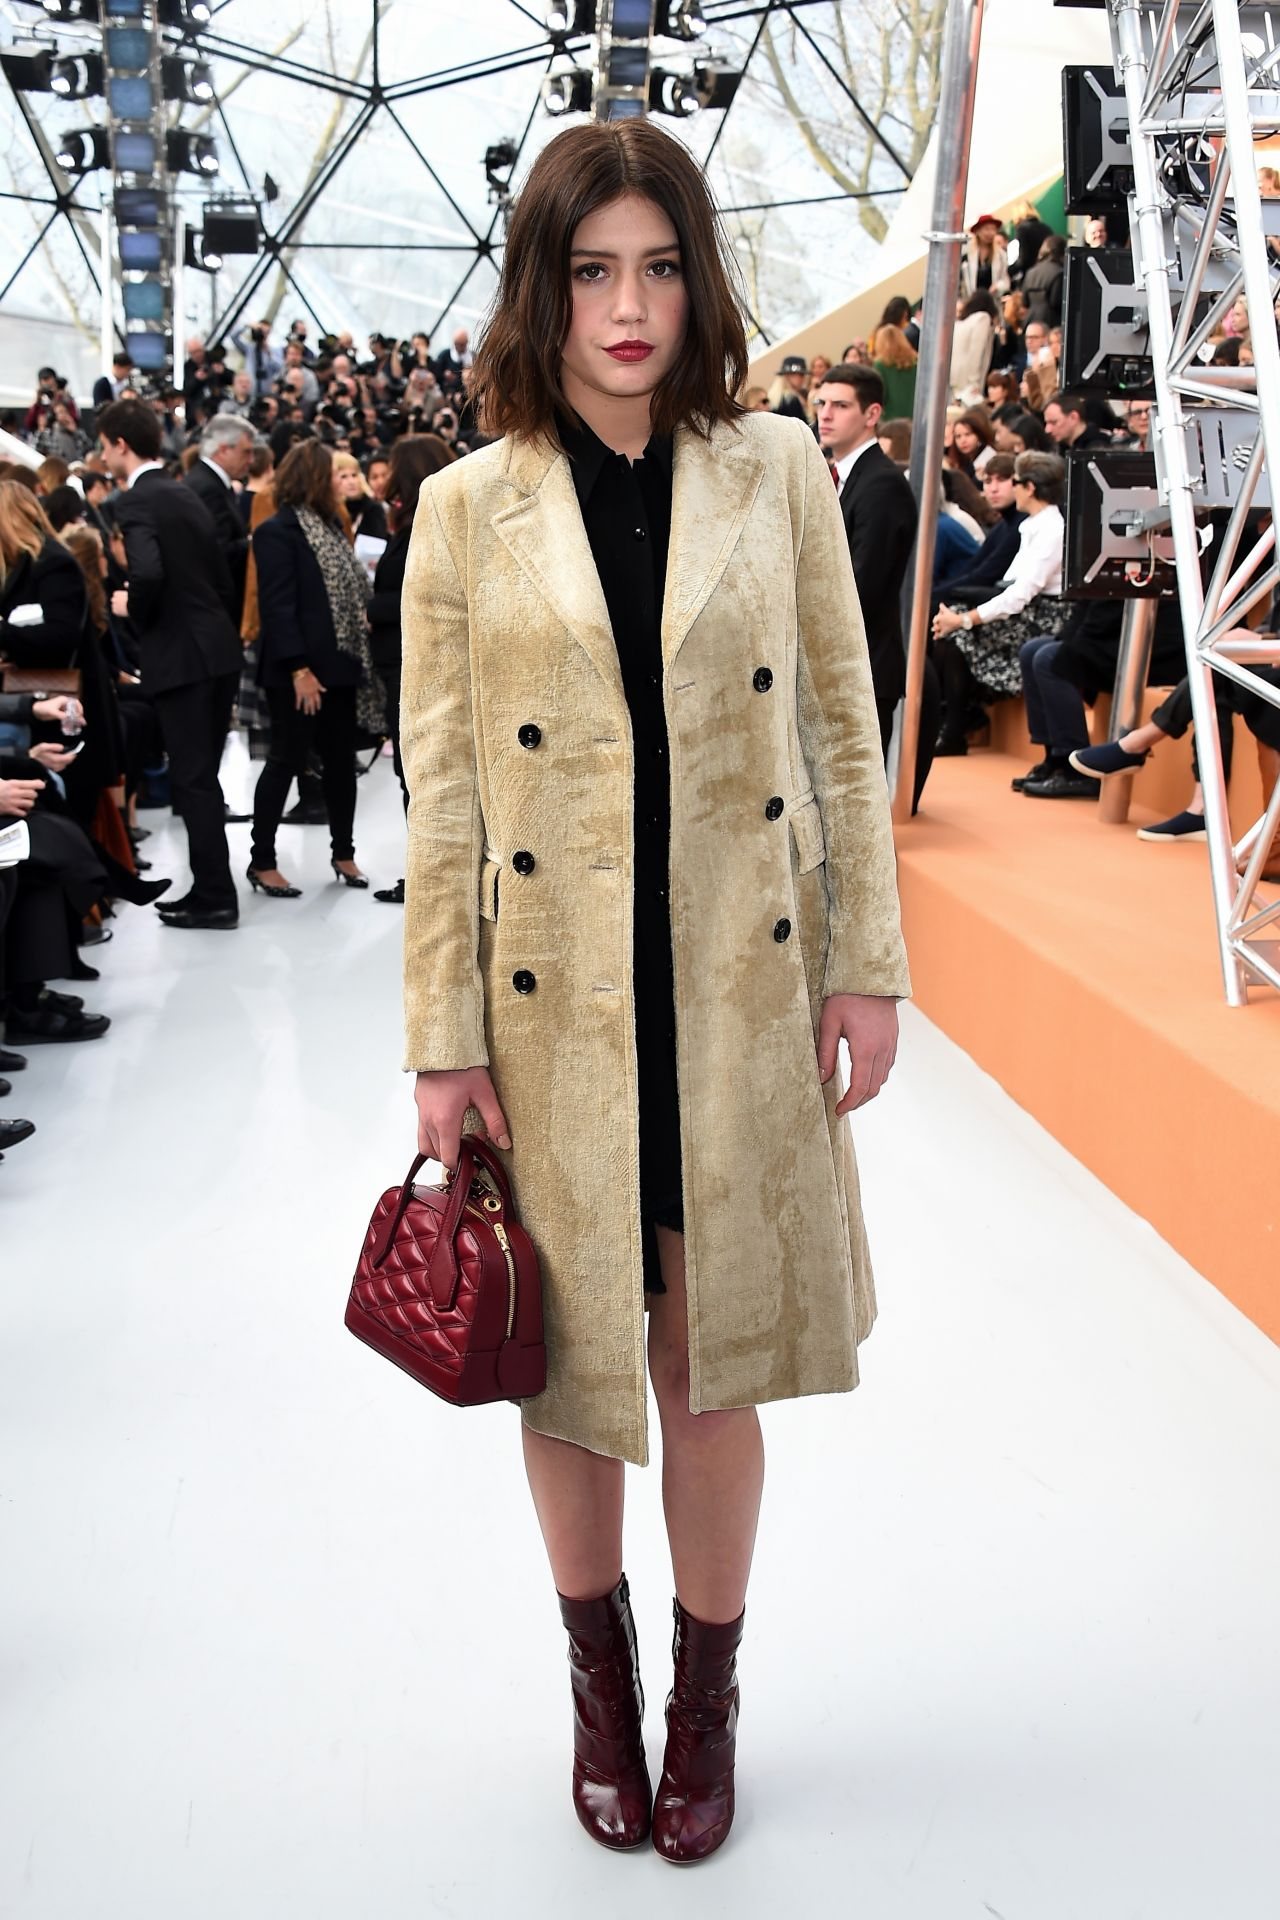 Louis Vuitton Fashion Show In